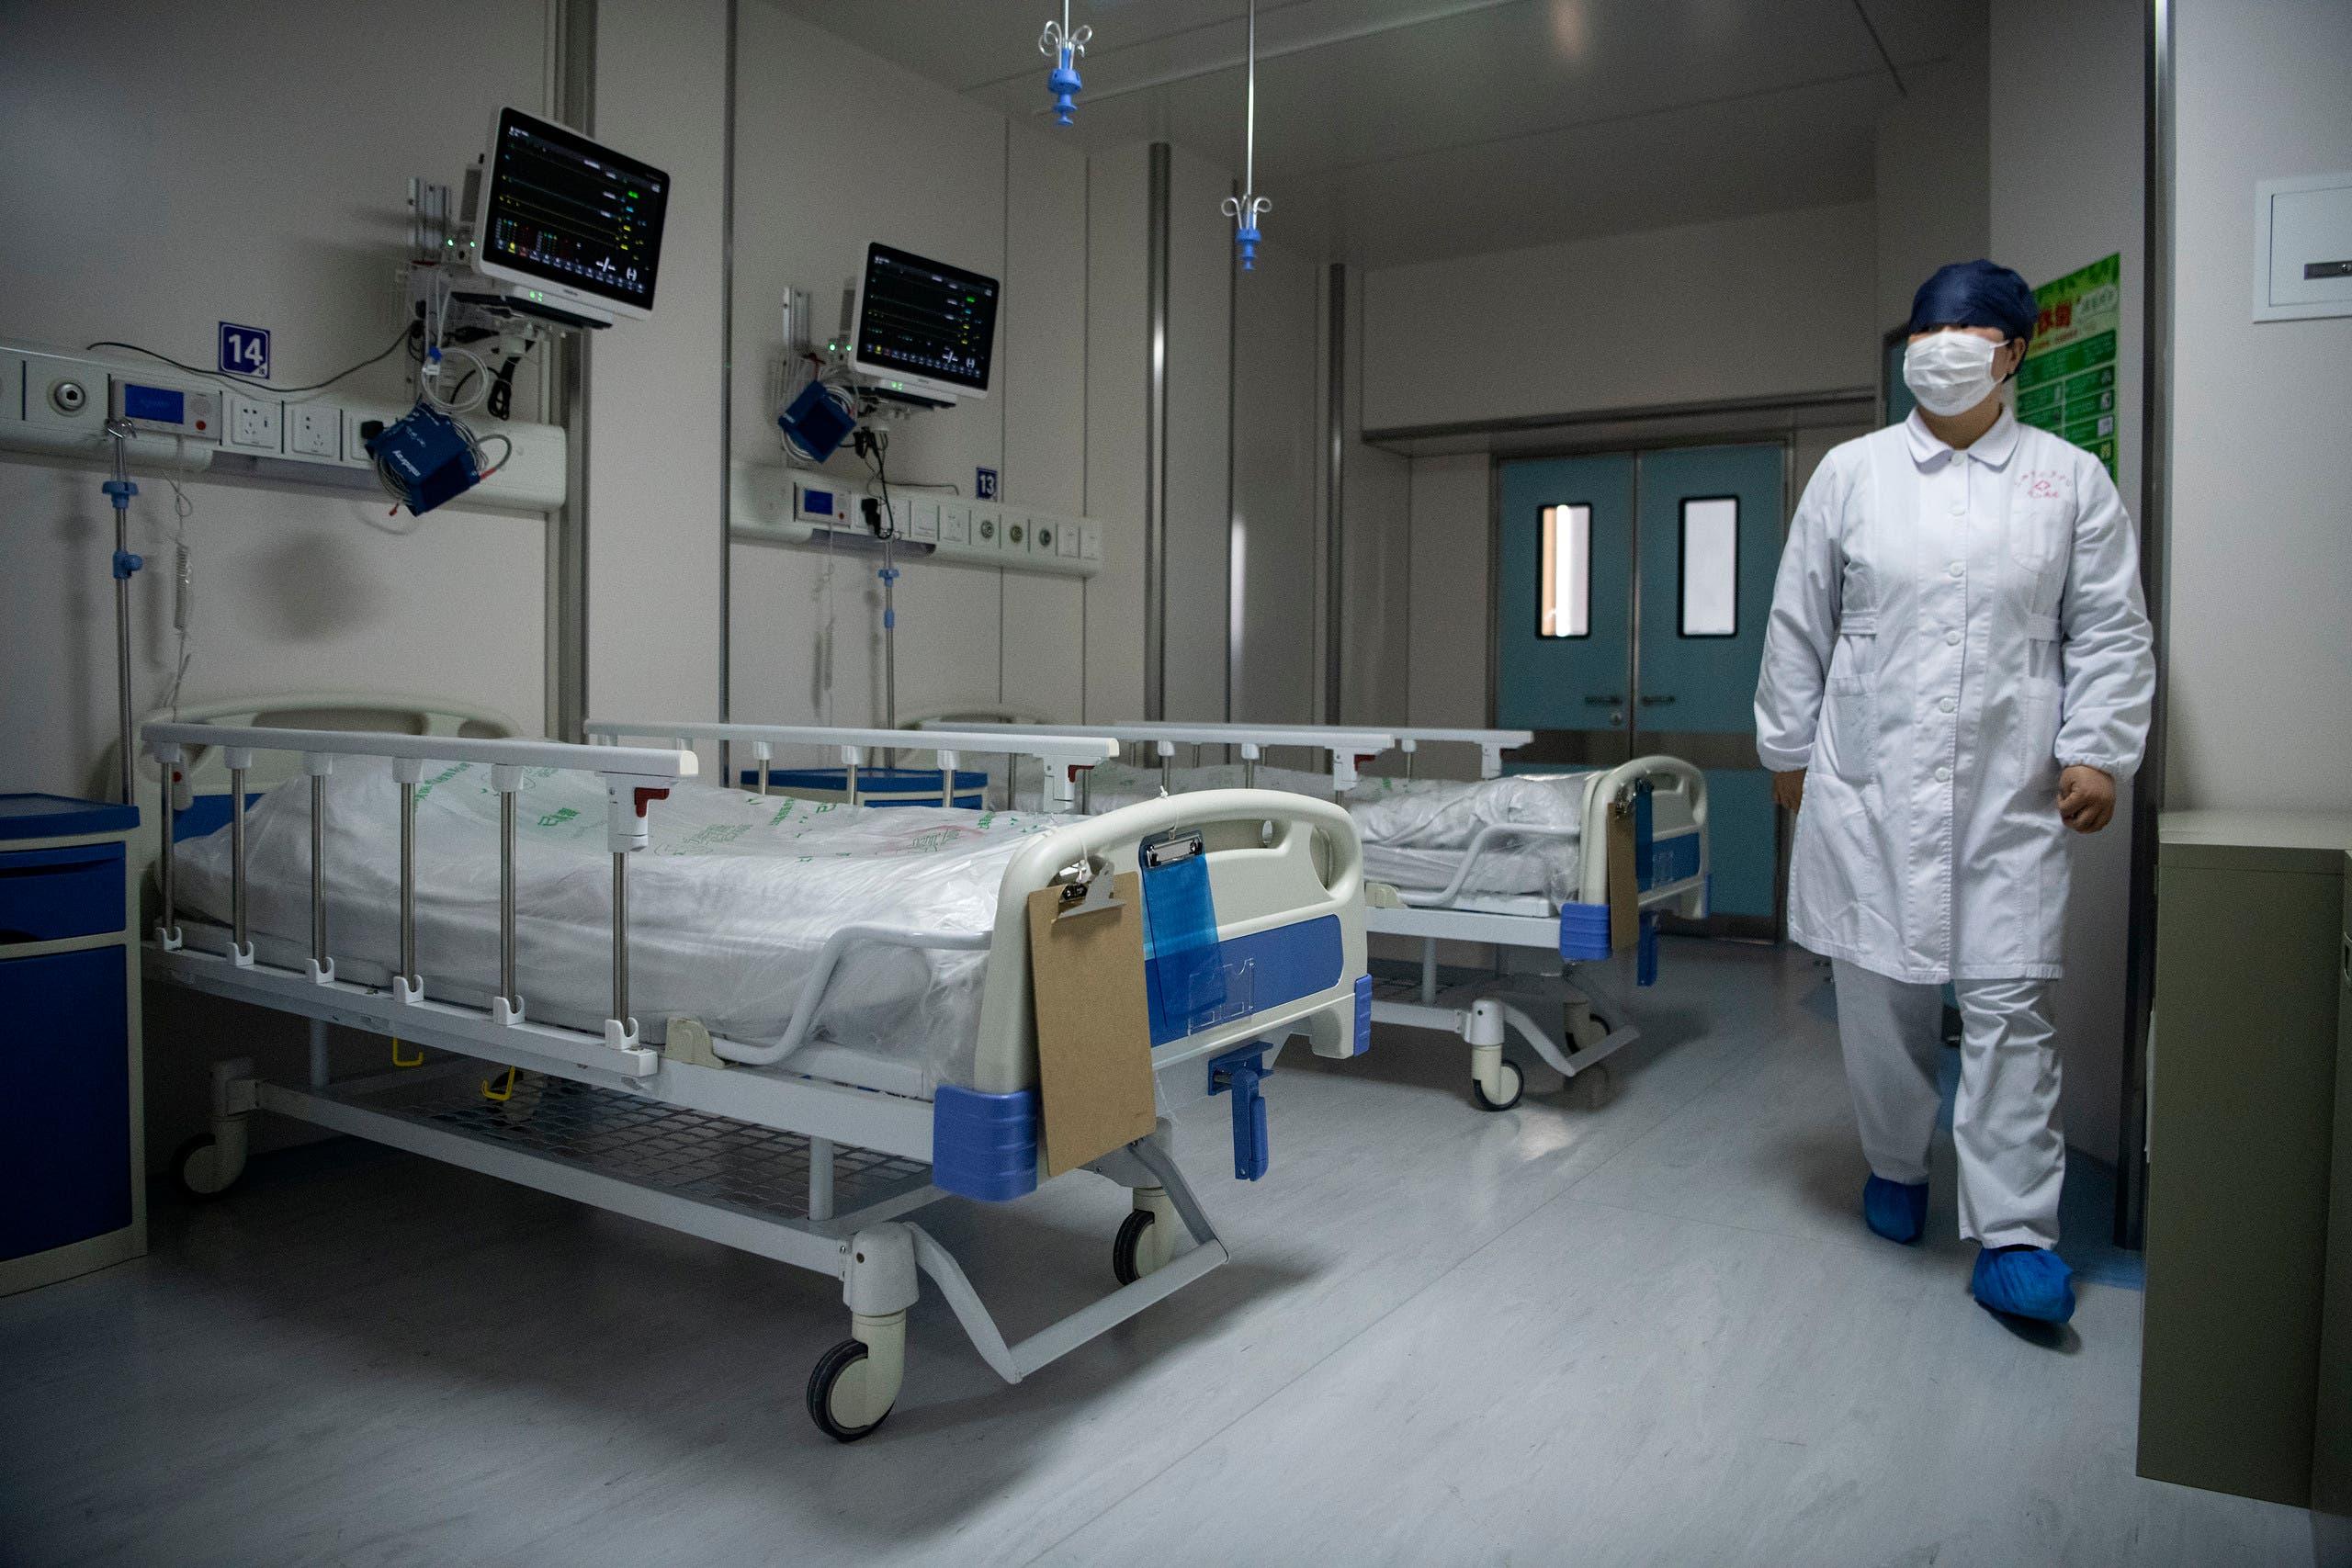 A nurse walks inside a quarantine room at the Shanghai Public Clinical Center, on February 17, 2020. (File photo: AFP)